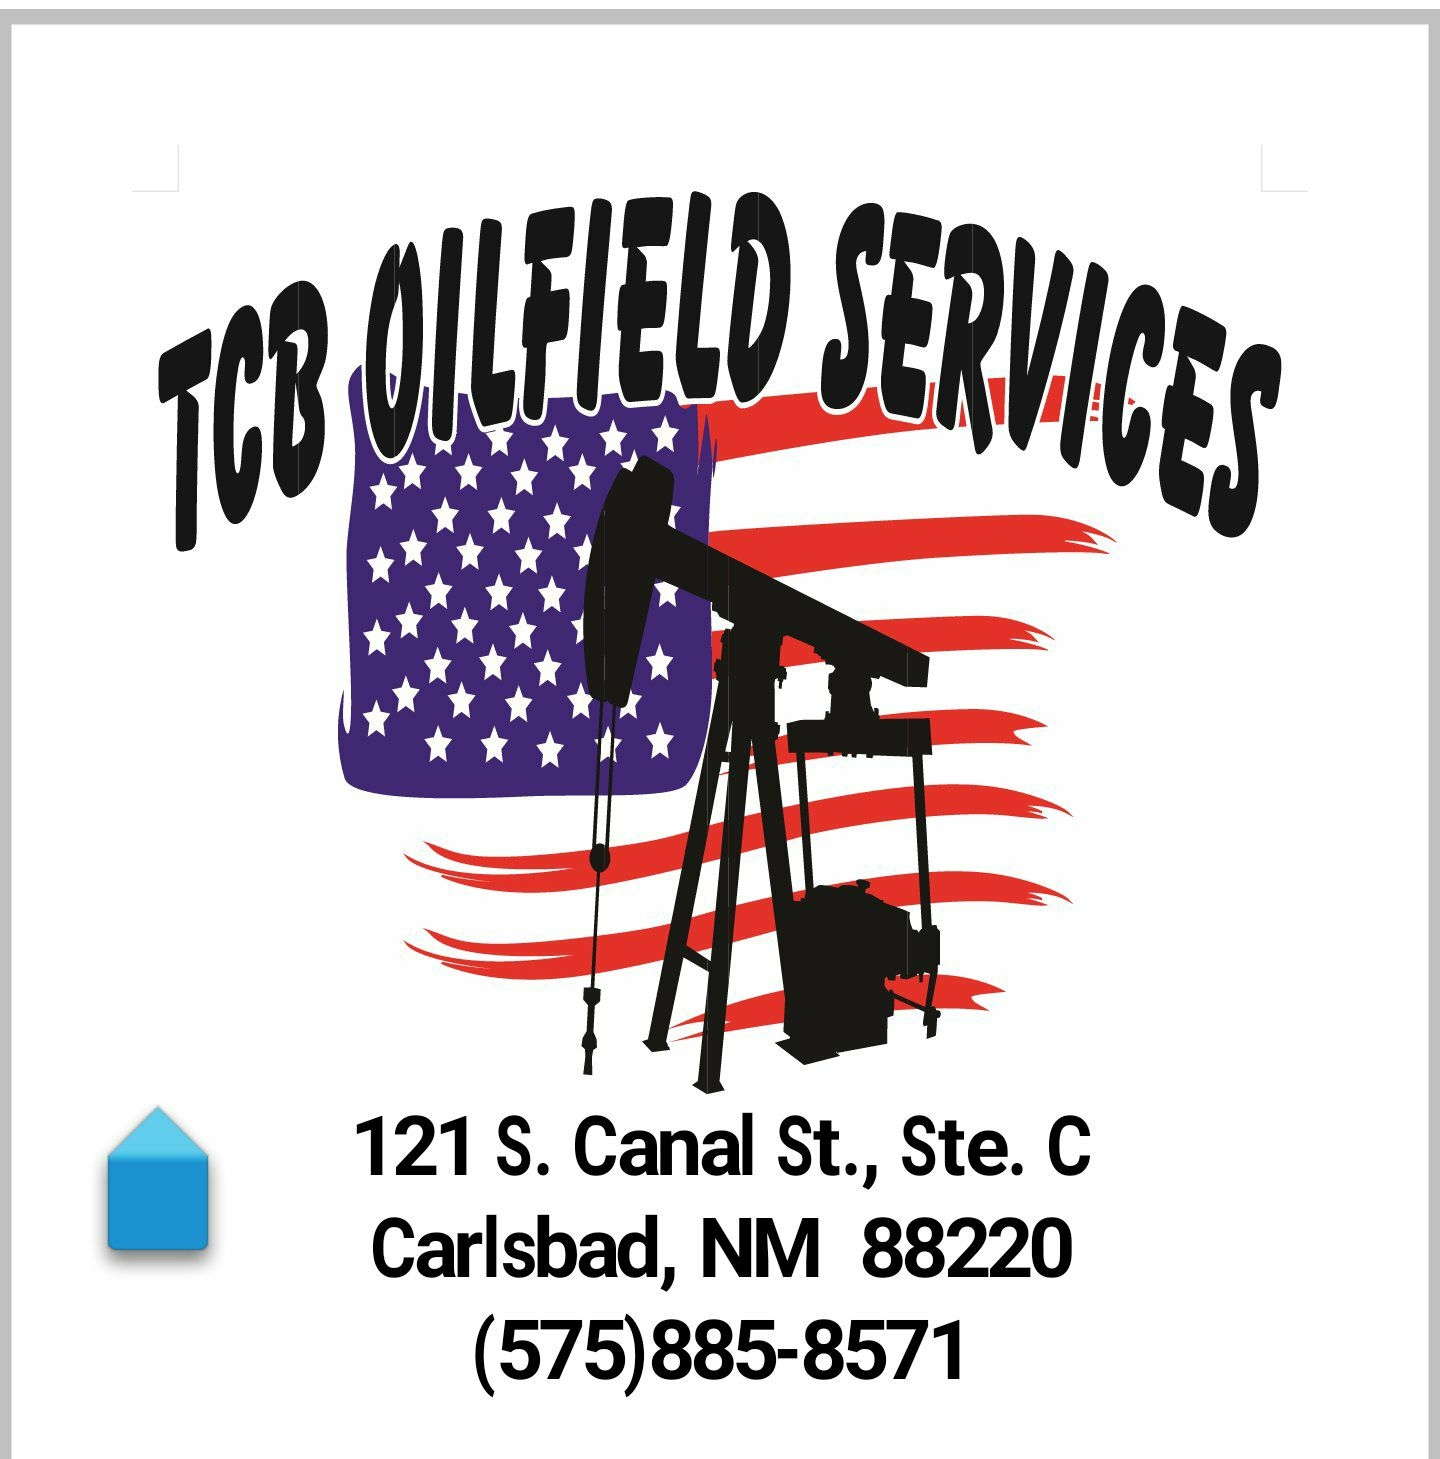 TCB Oilfield Services-logo